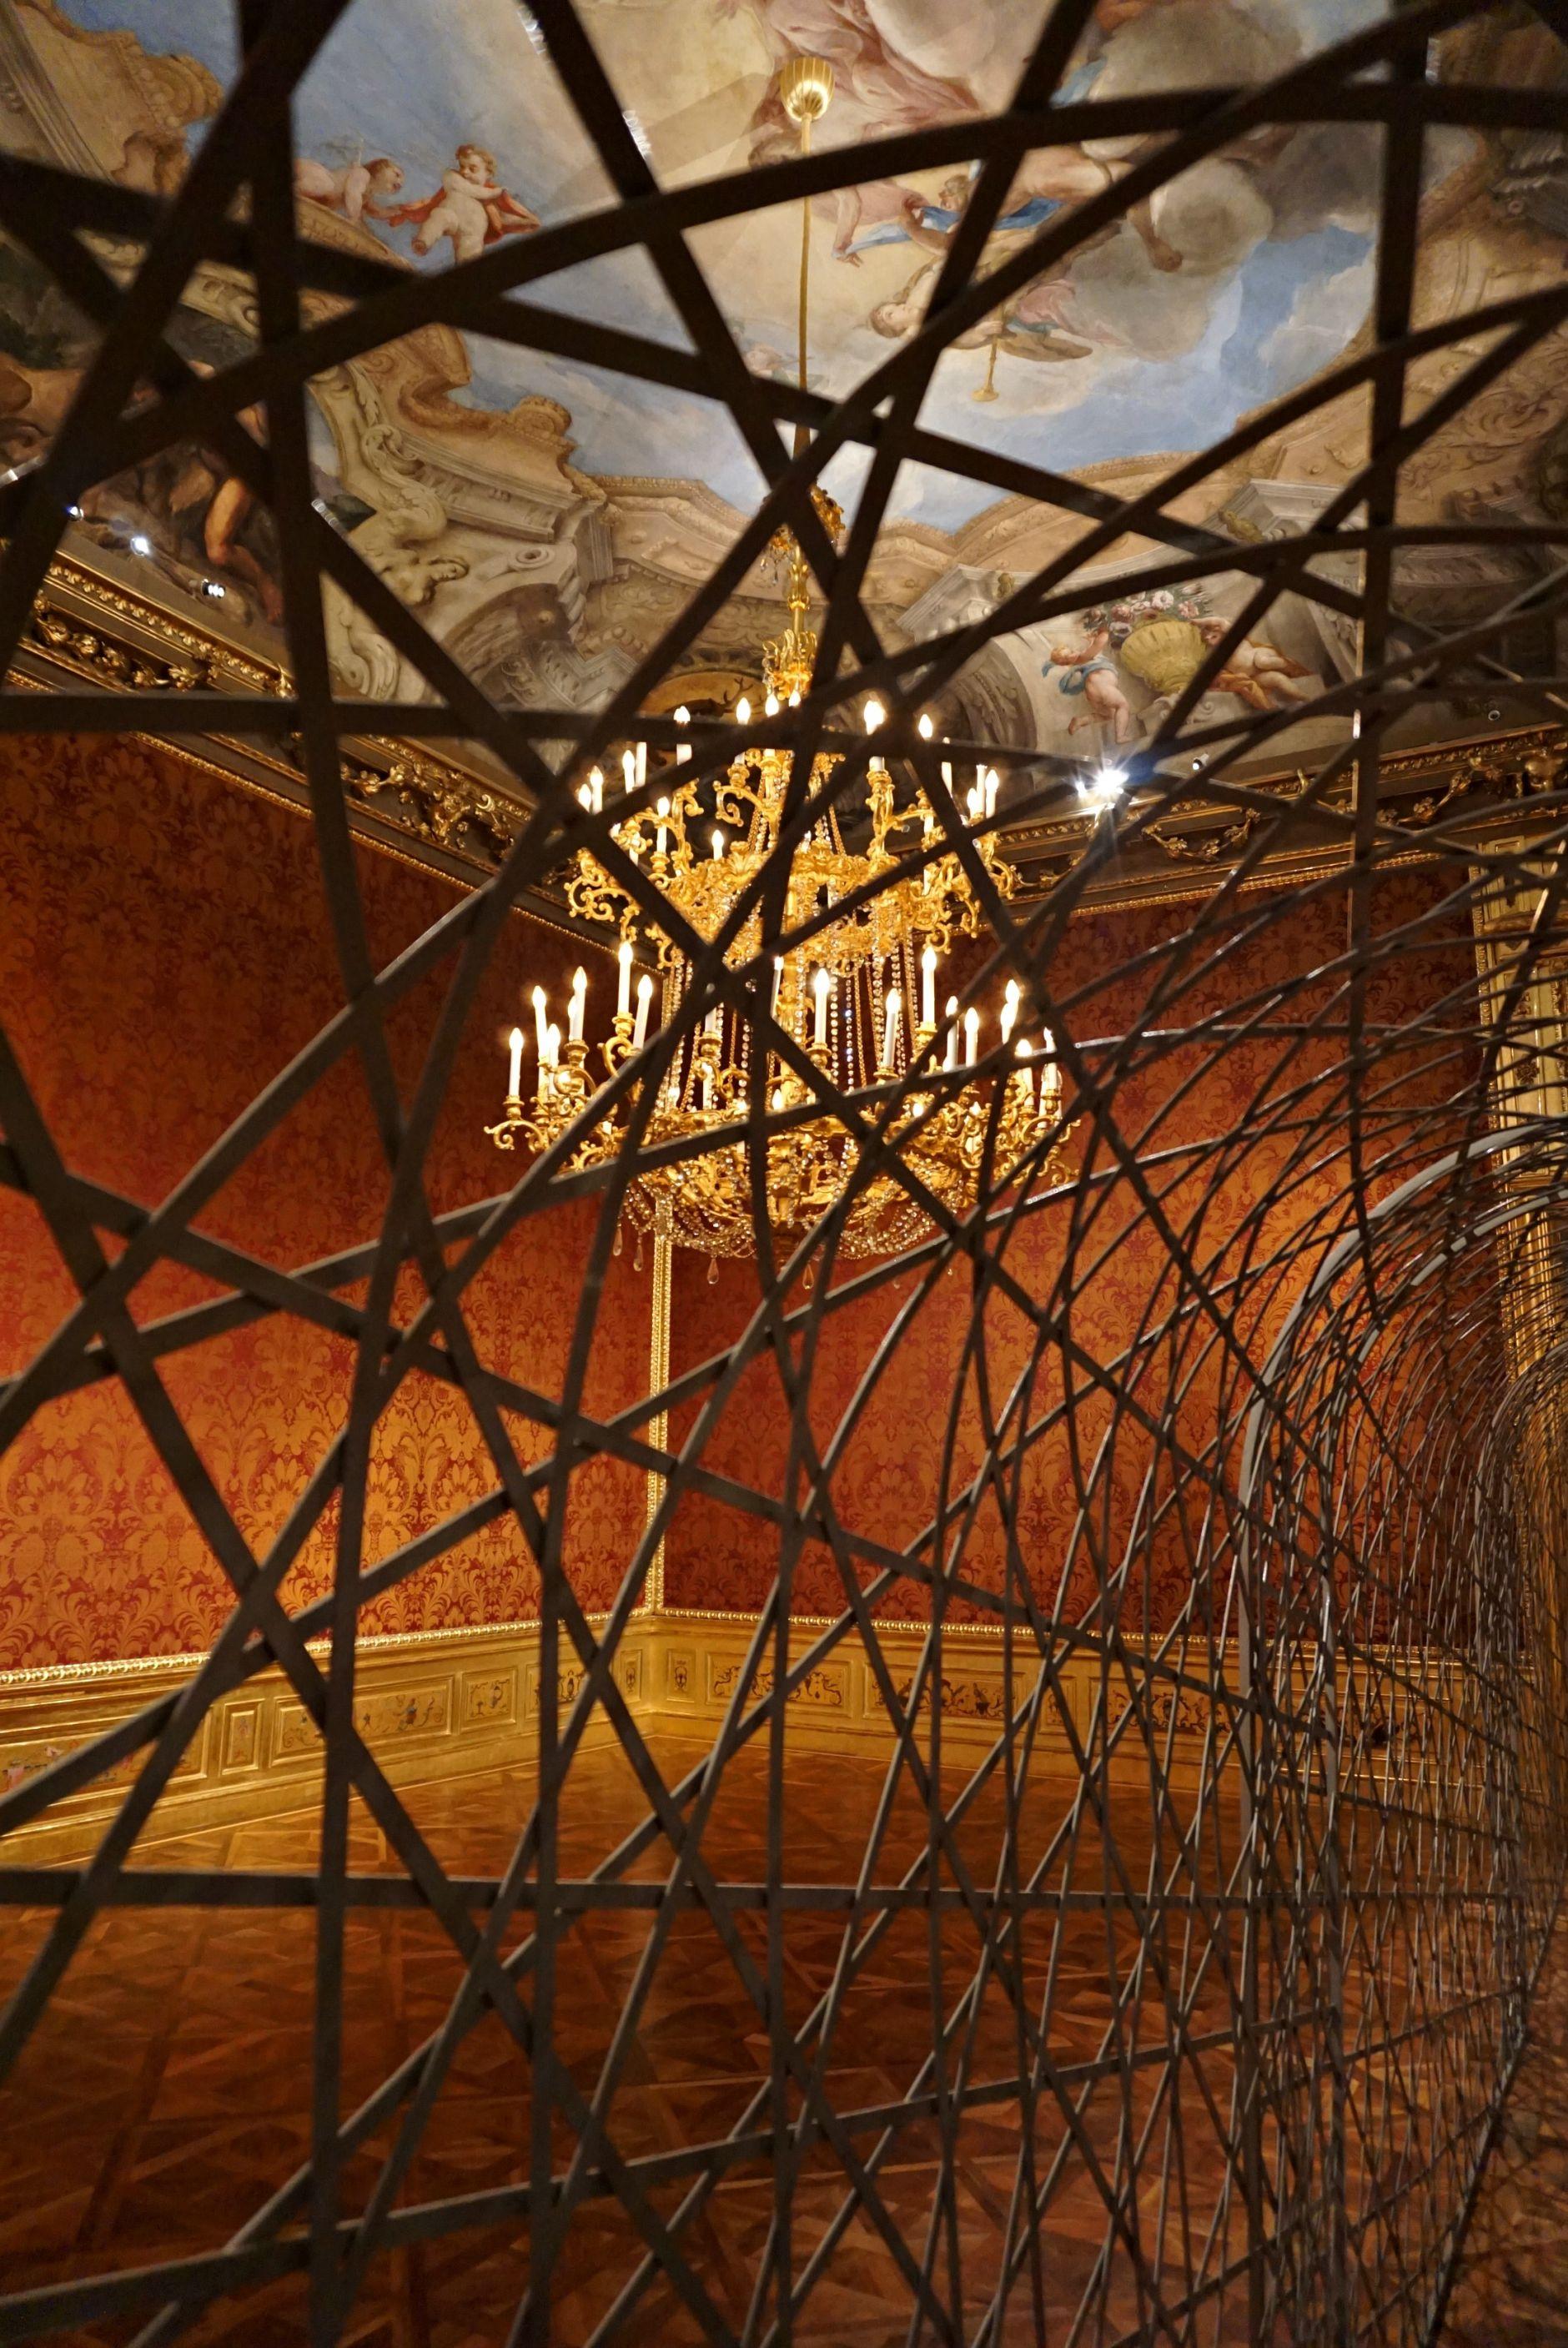 dc-art-olafur-eliasson-baroque-baroque-the-winter-palace-of-prince-eugene-of-savoy-vienna-09